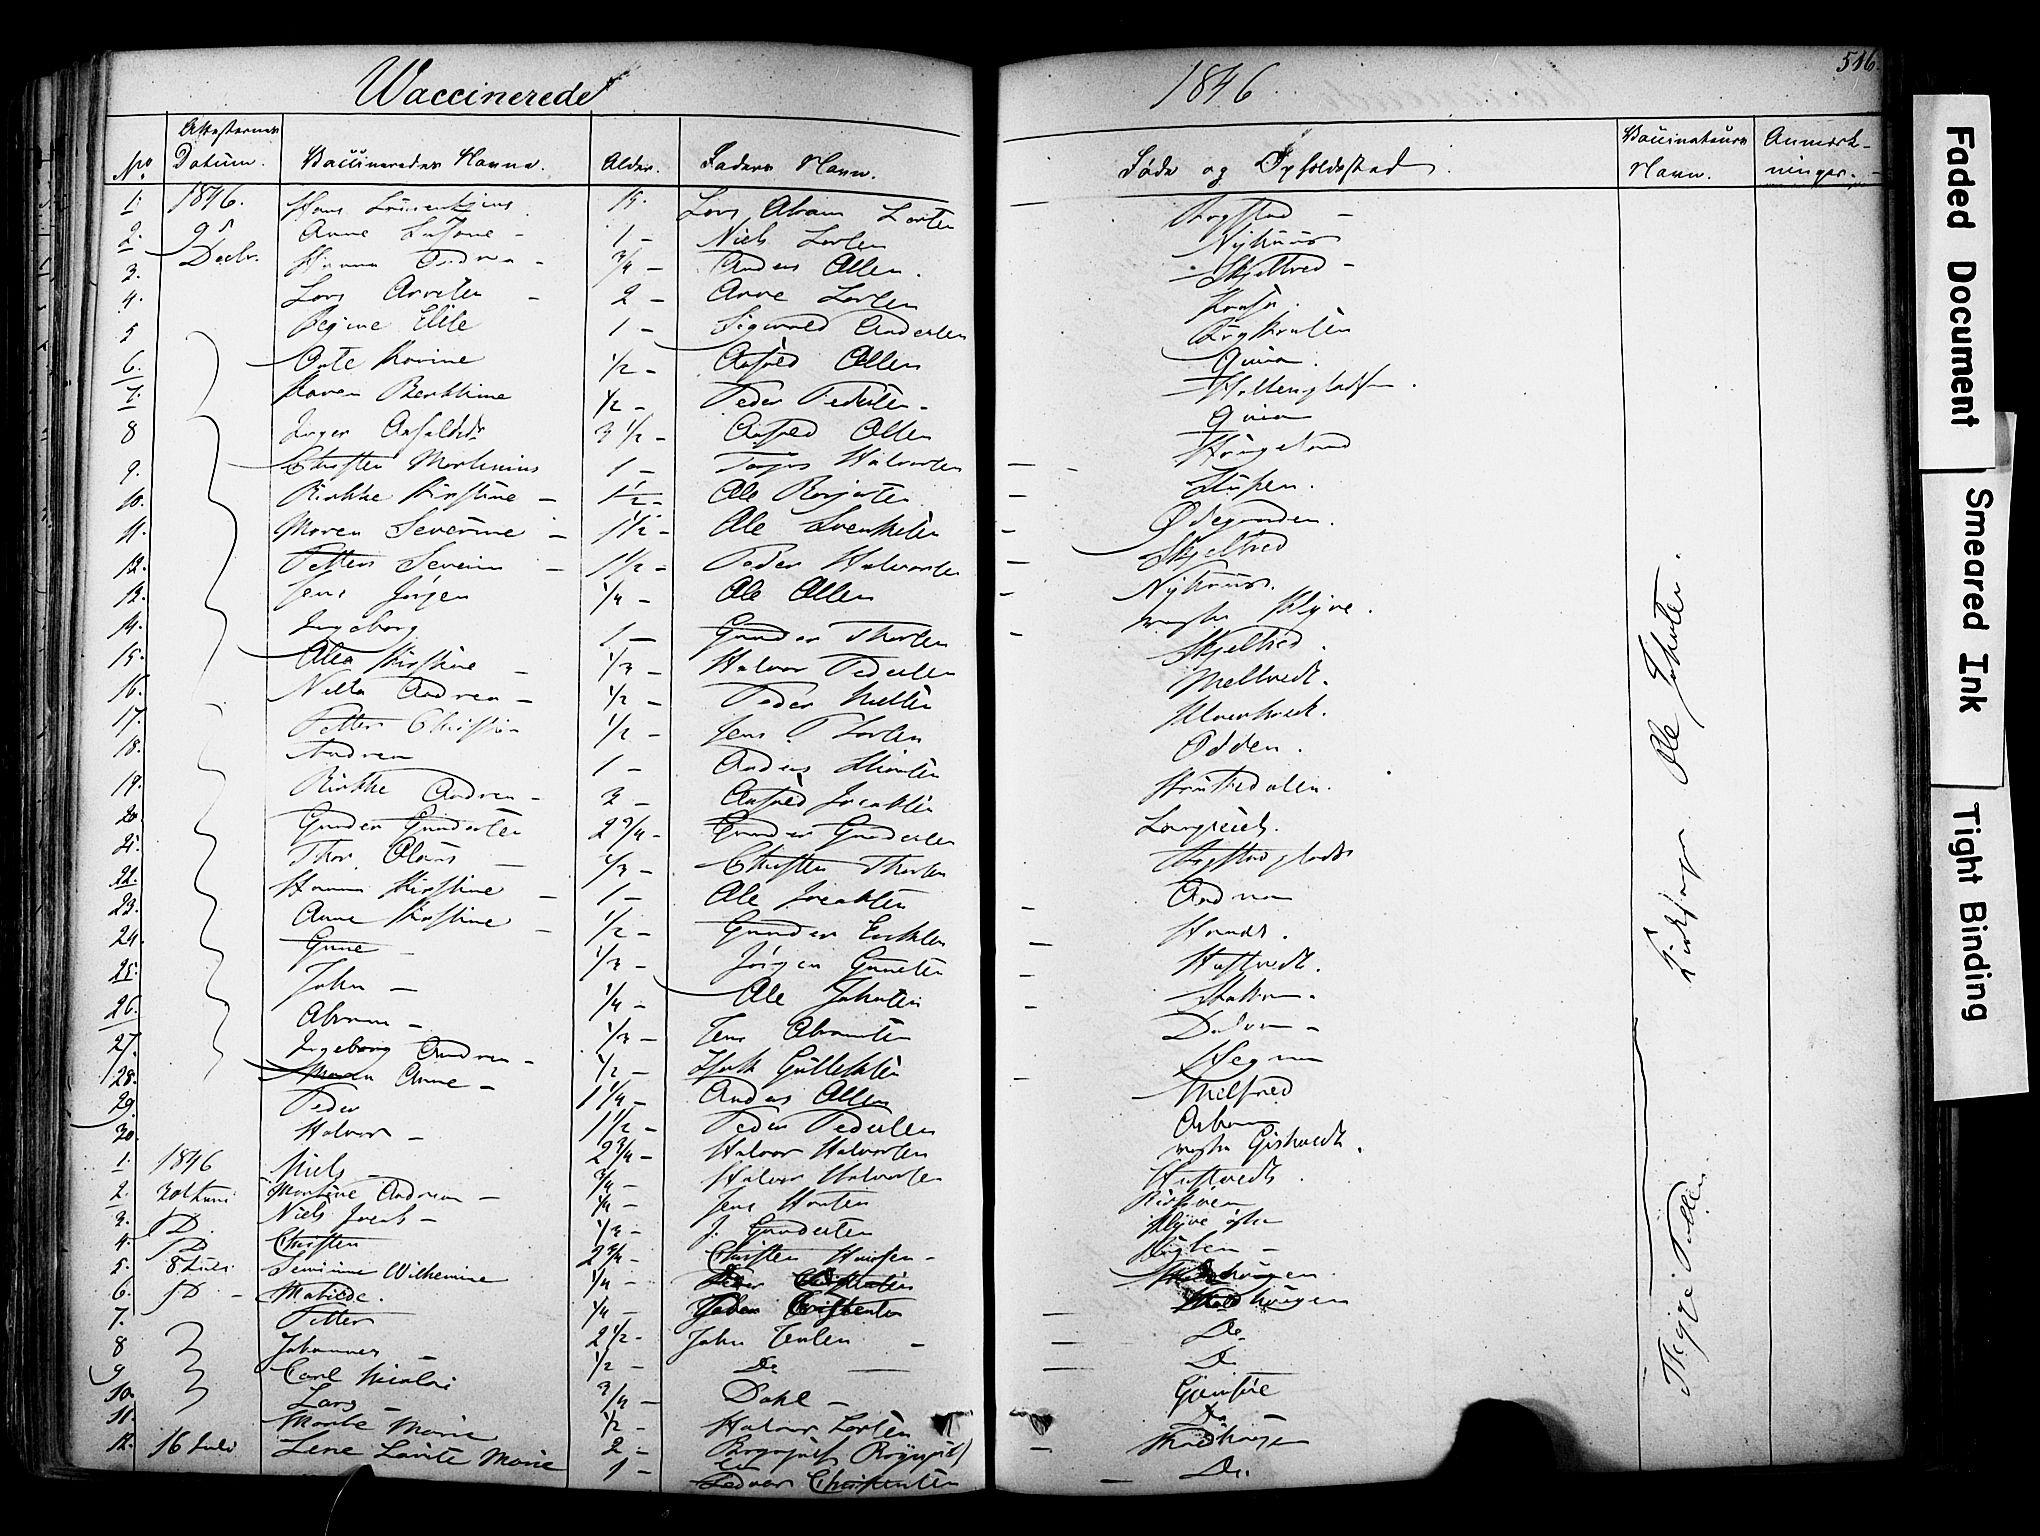 SAKO, Solum kirkebøker, F/Fa/L0006: Ministerialbok nr. I 6, 1844-1855, s. 516